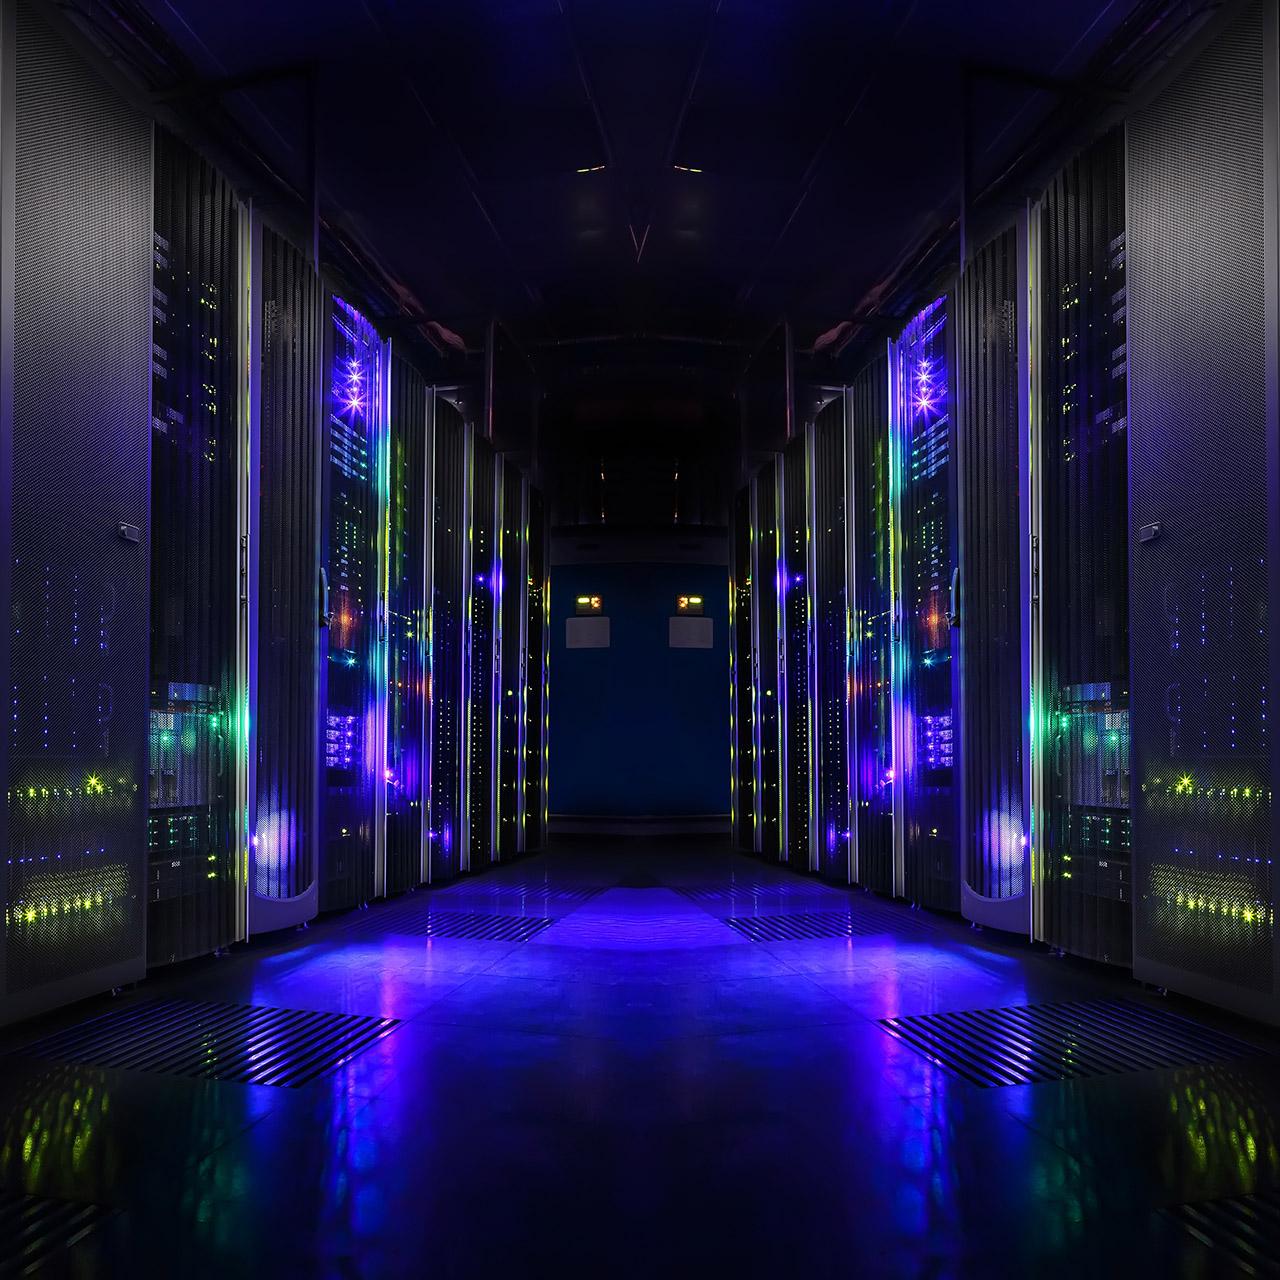 server room for cloud computing